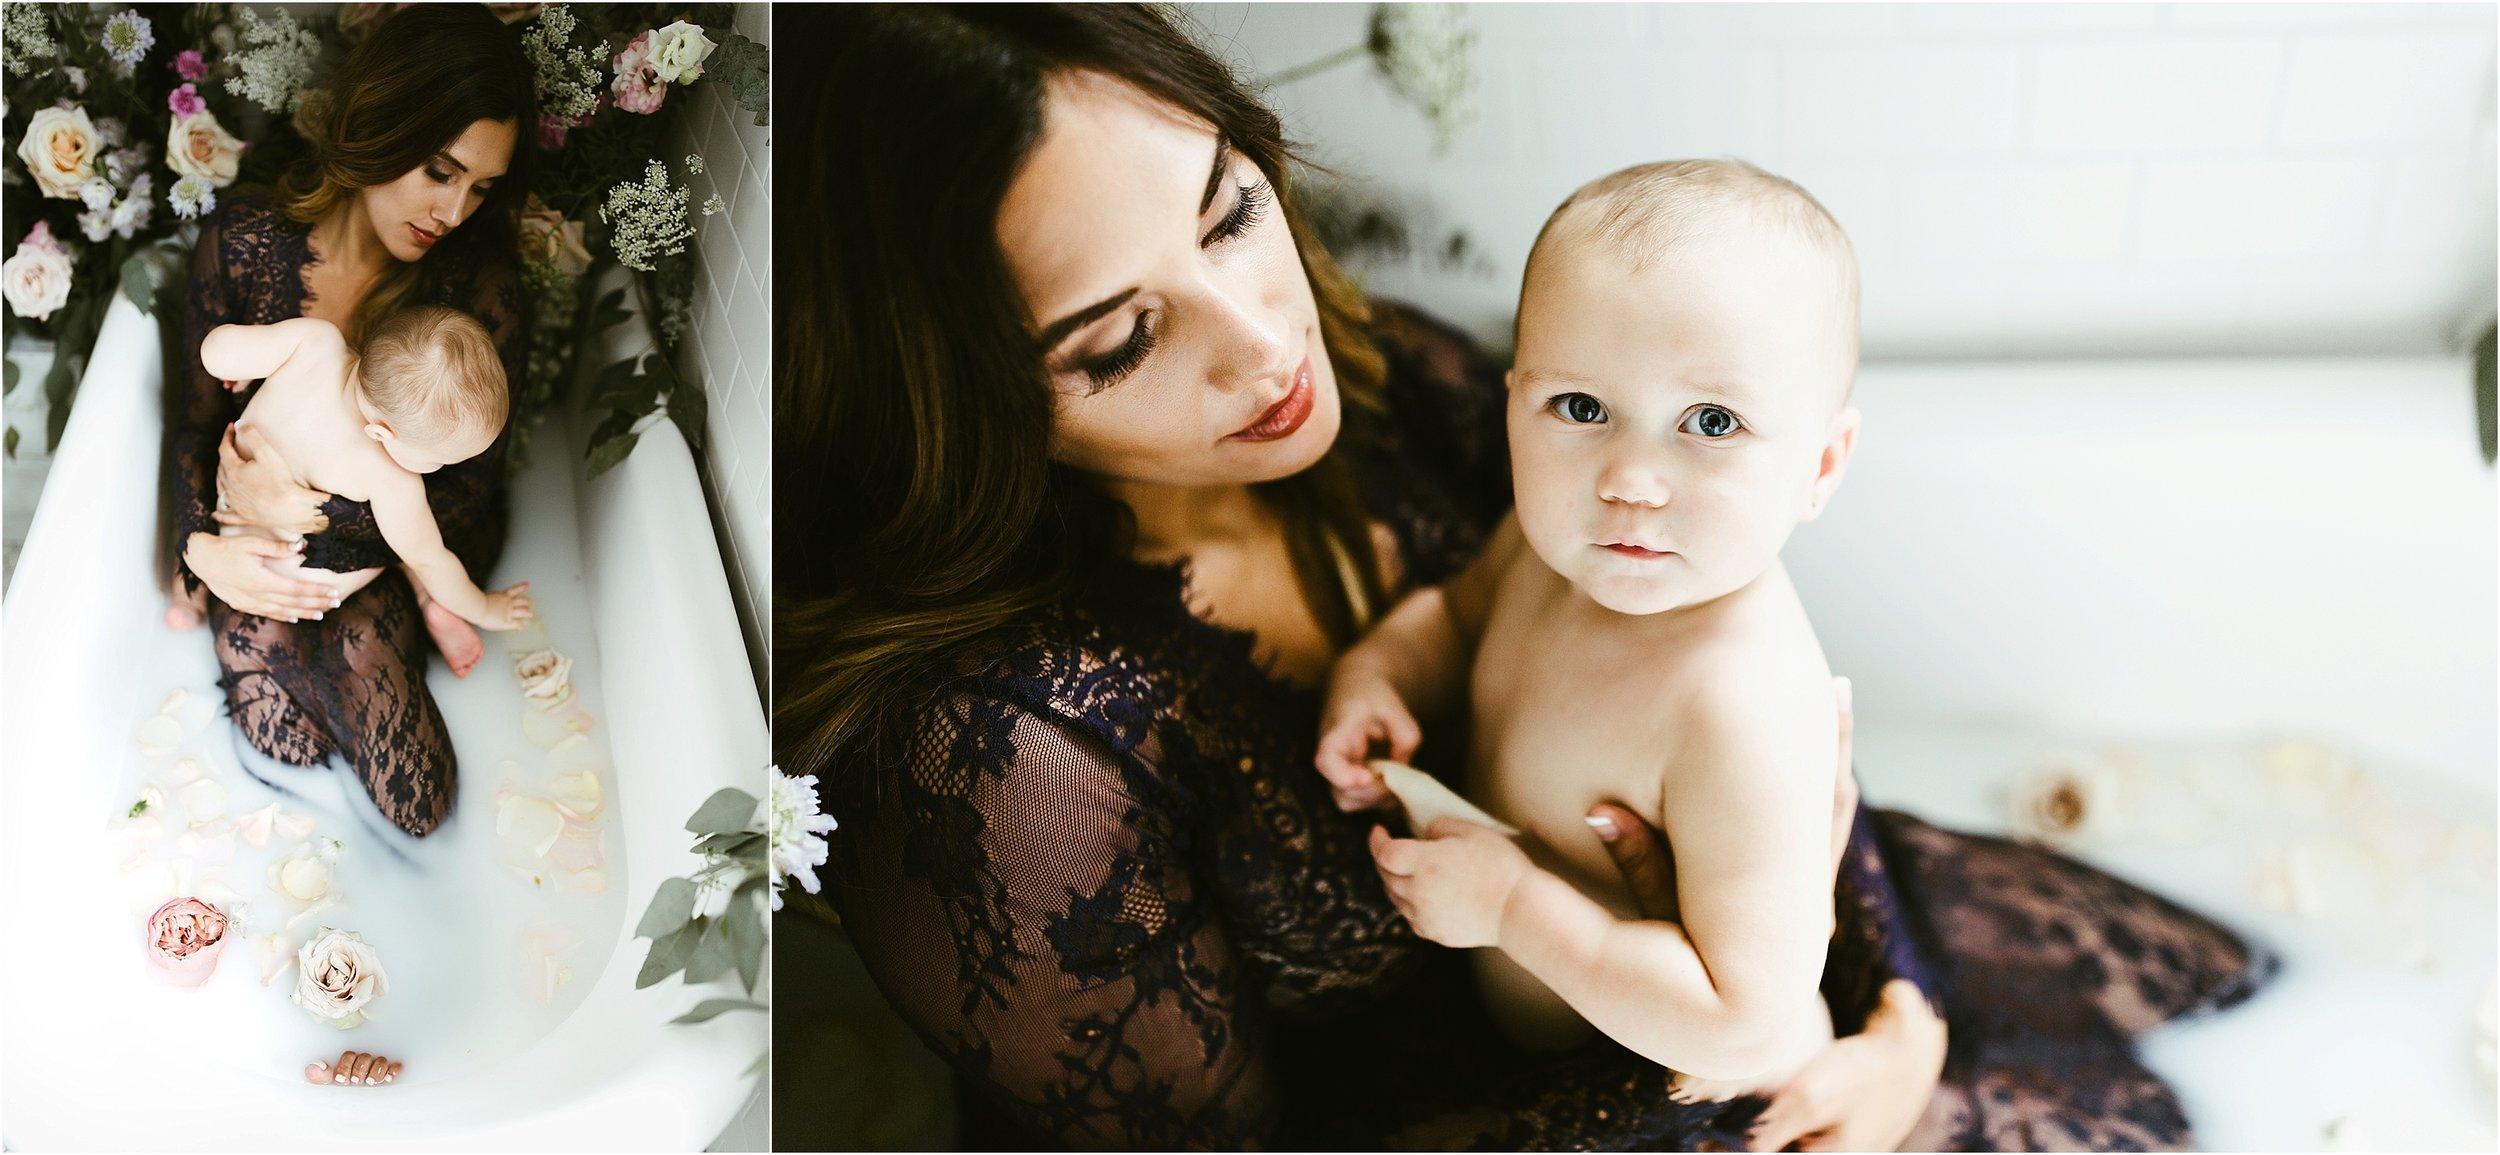 Quaint-and-Whim-Louisiana-Milk-Bath-Photography-Maternity-001.JPG